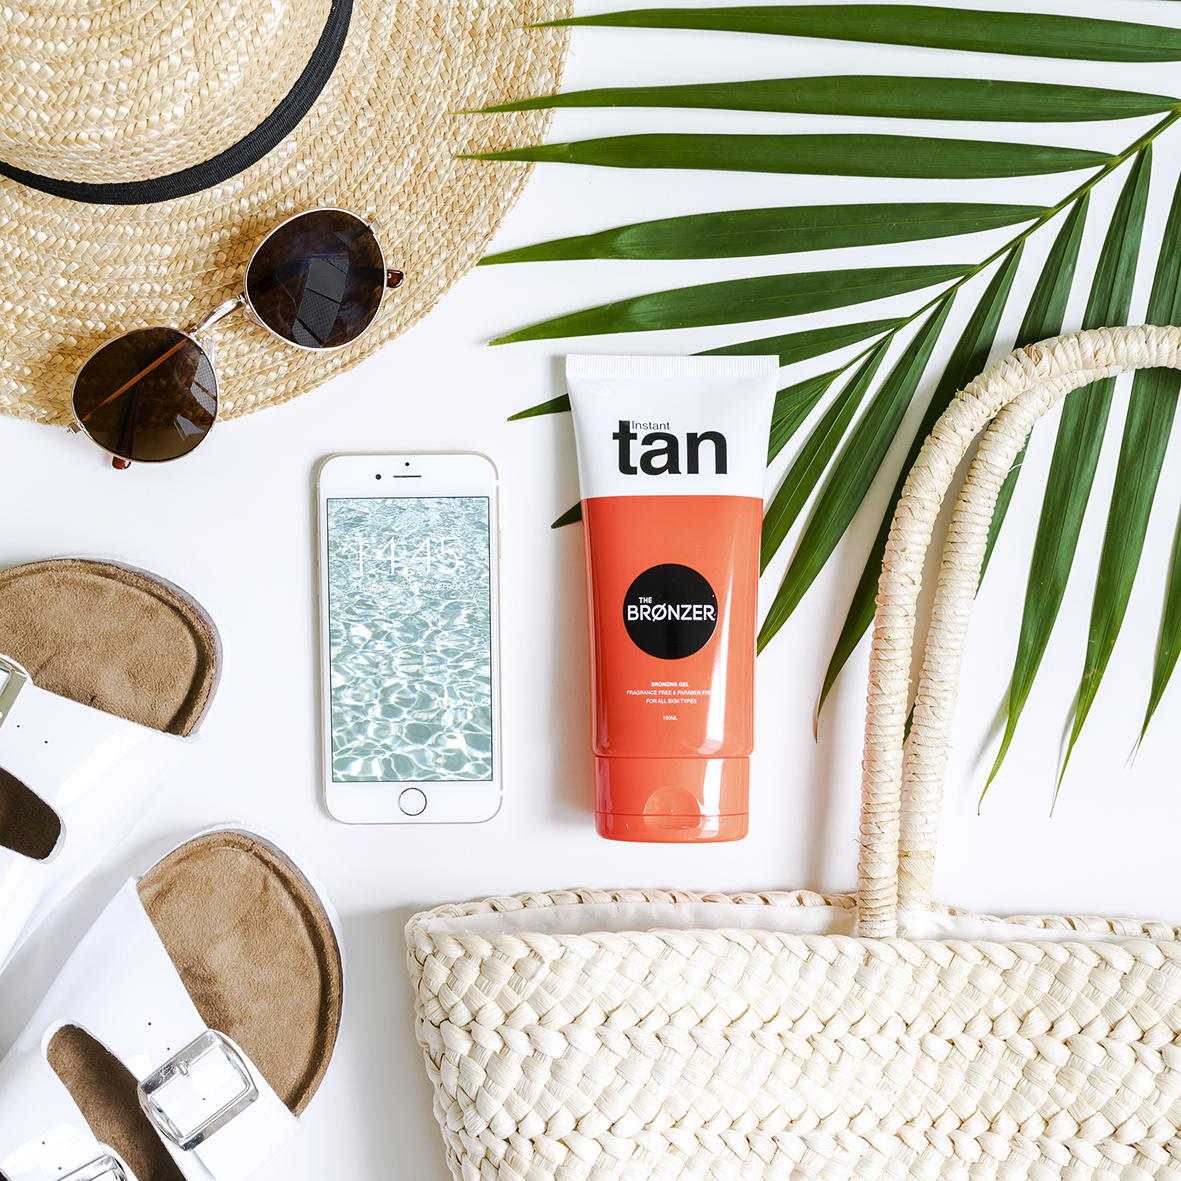 styled beach essentials flatlay photo